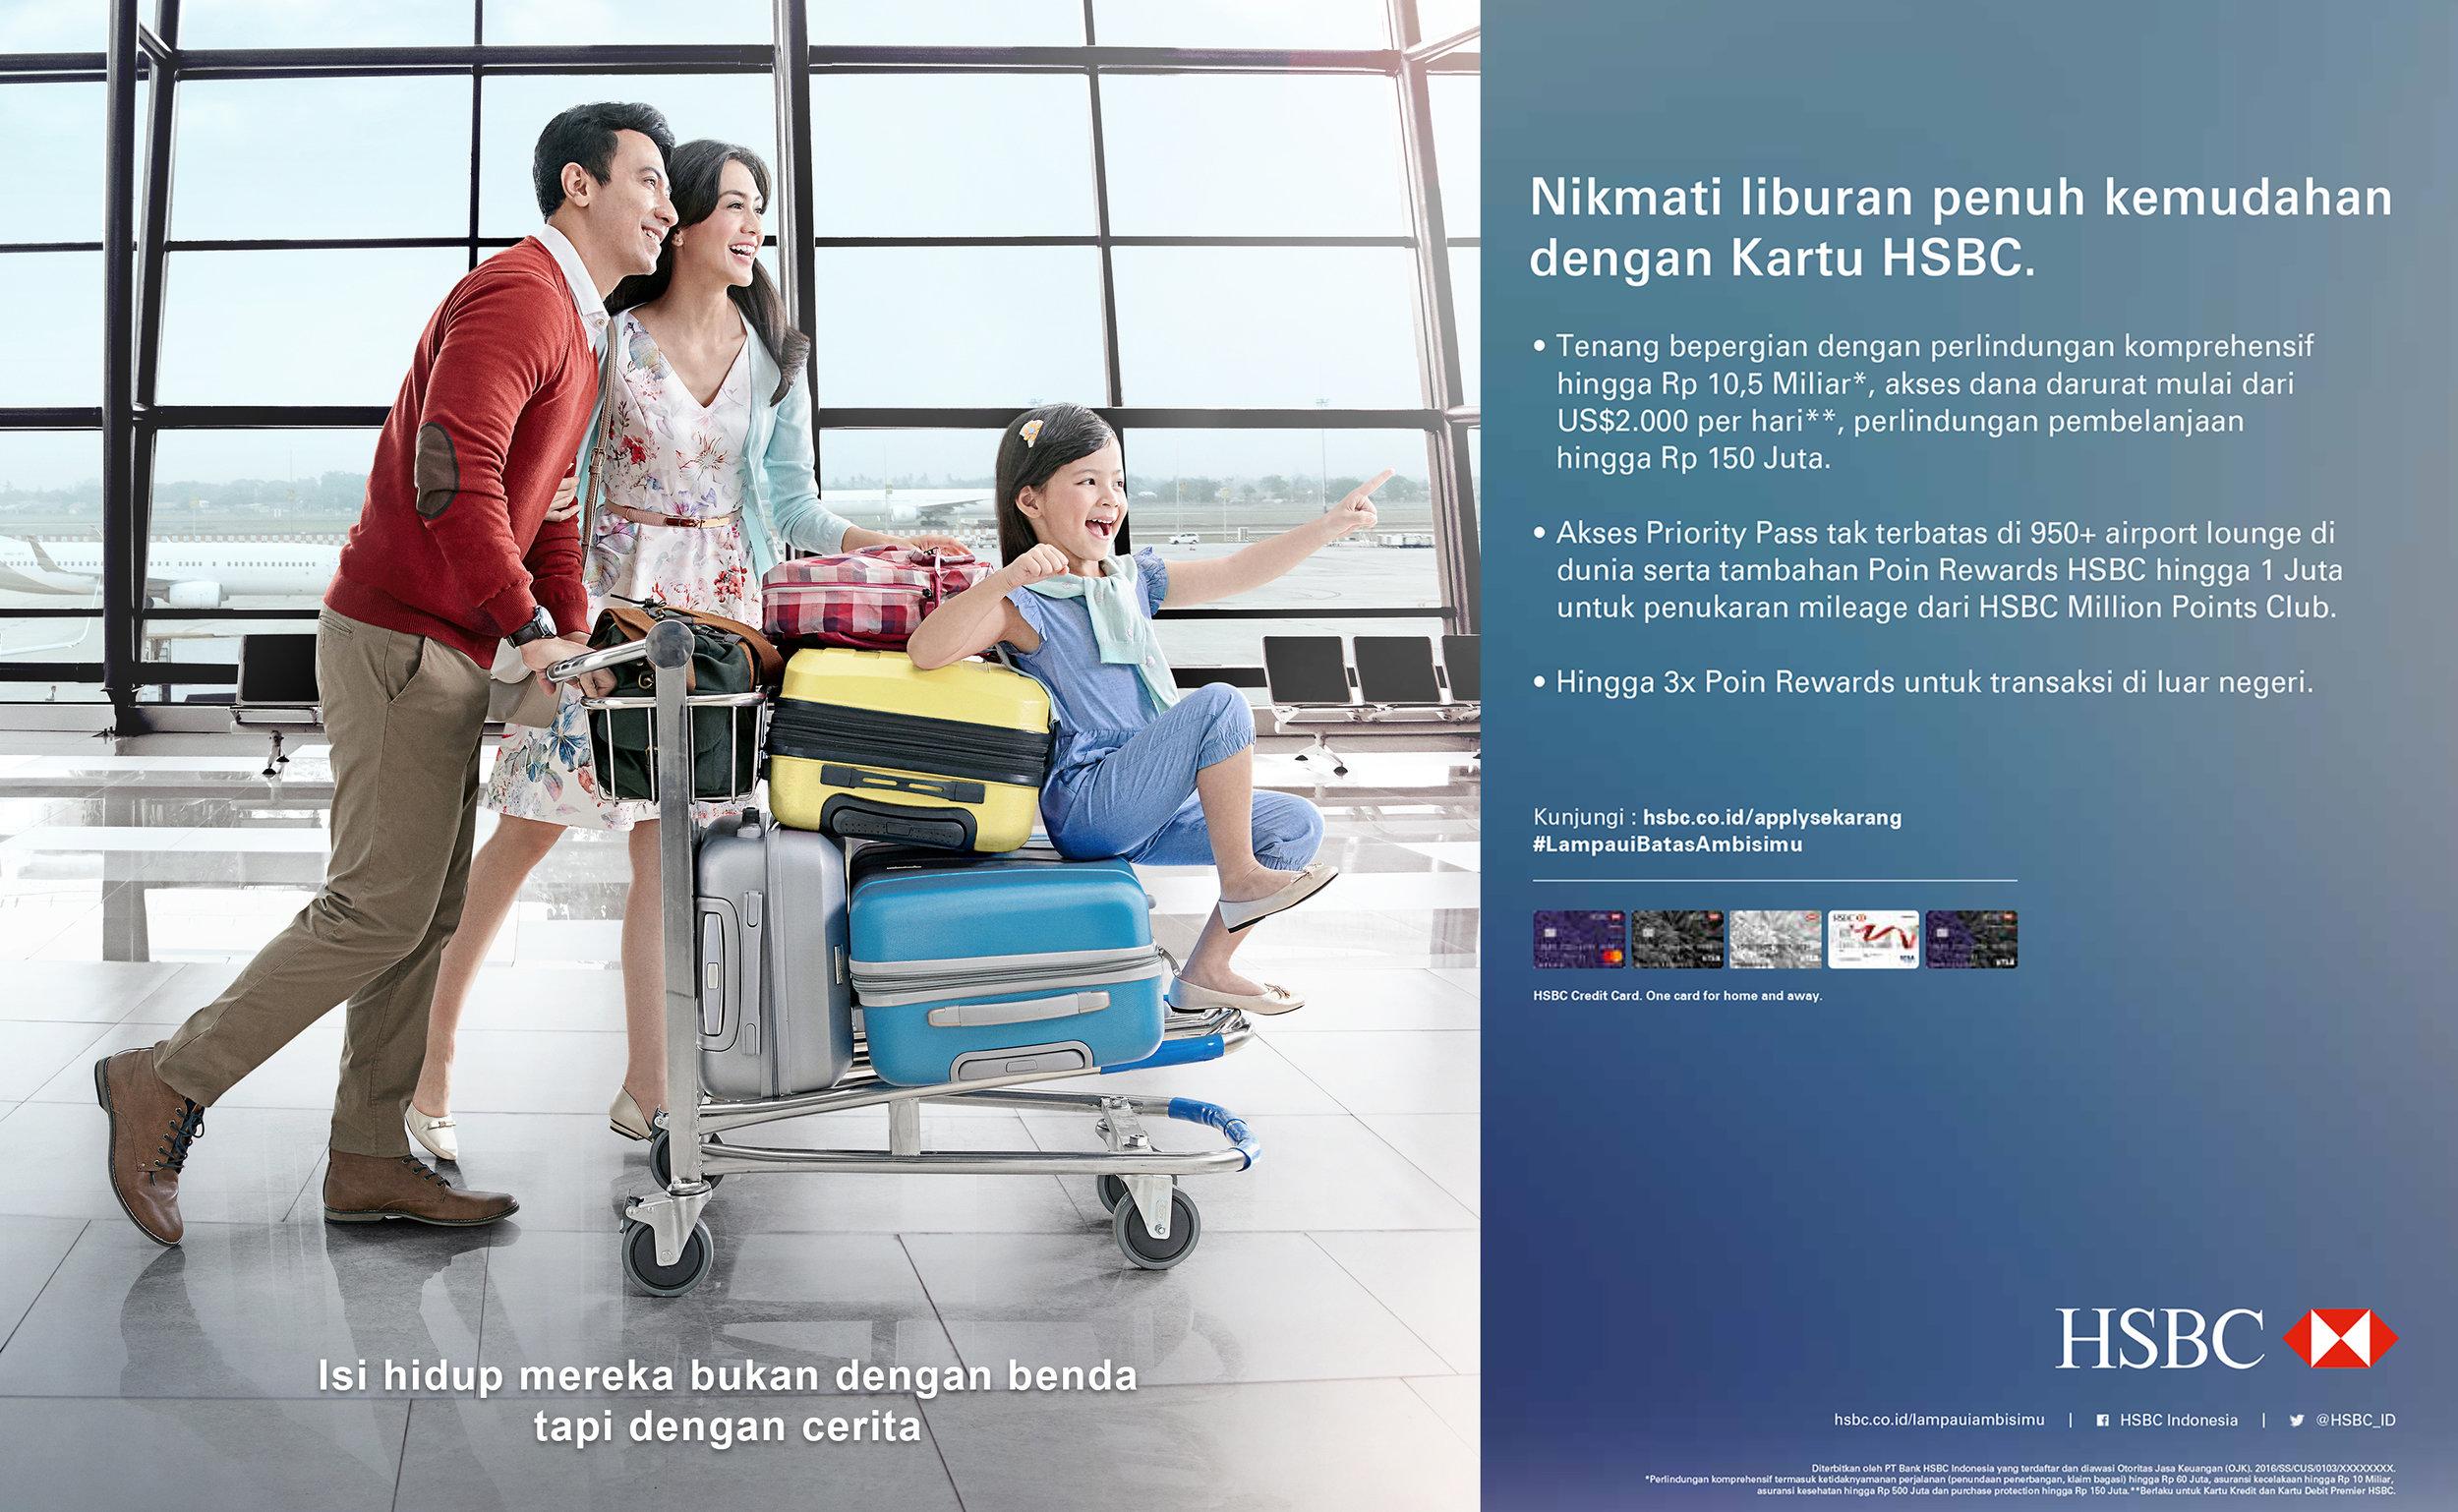 HSBC Travel Airport_325x200mm INDO.jpg